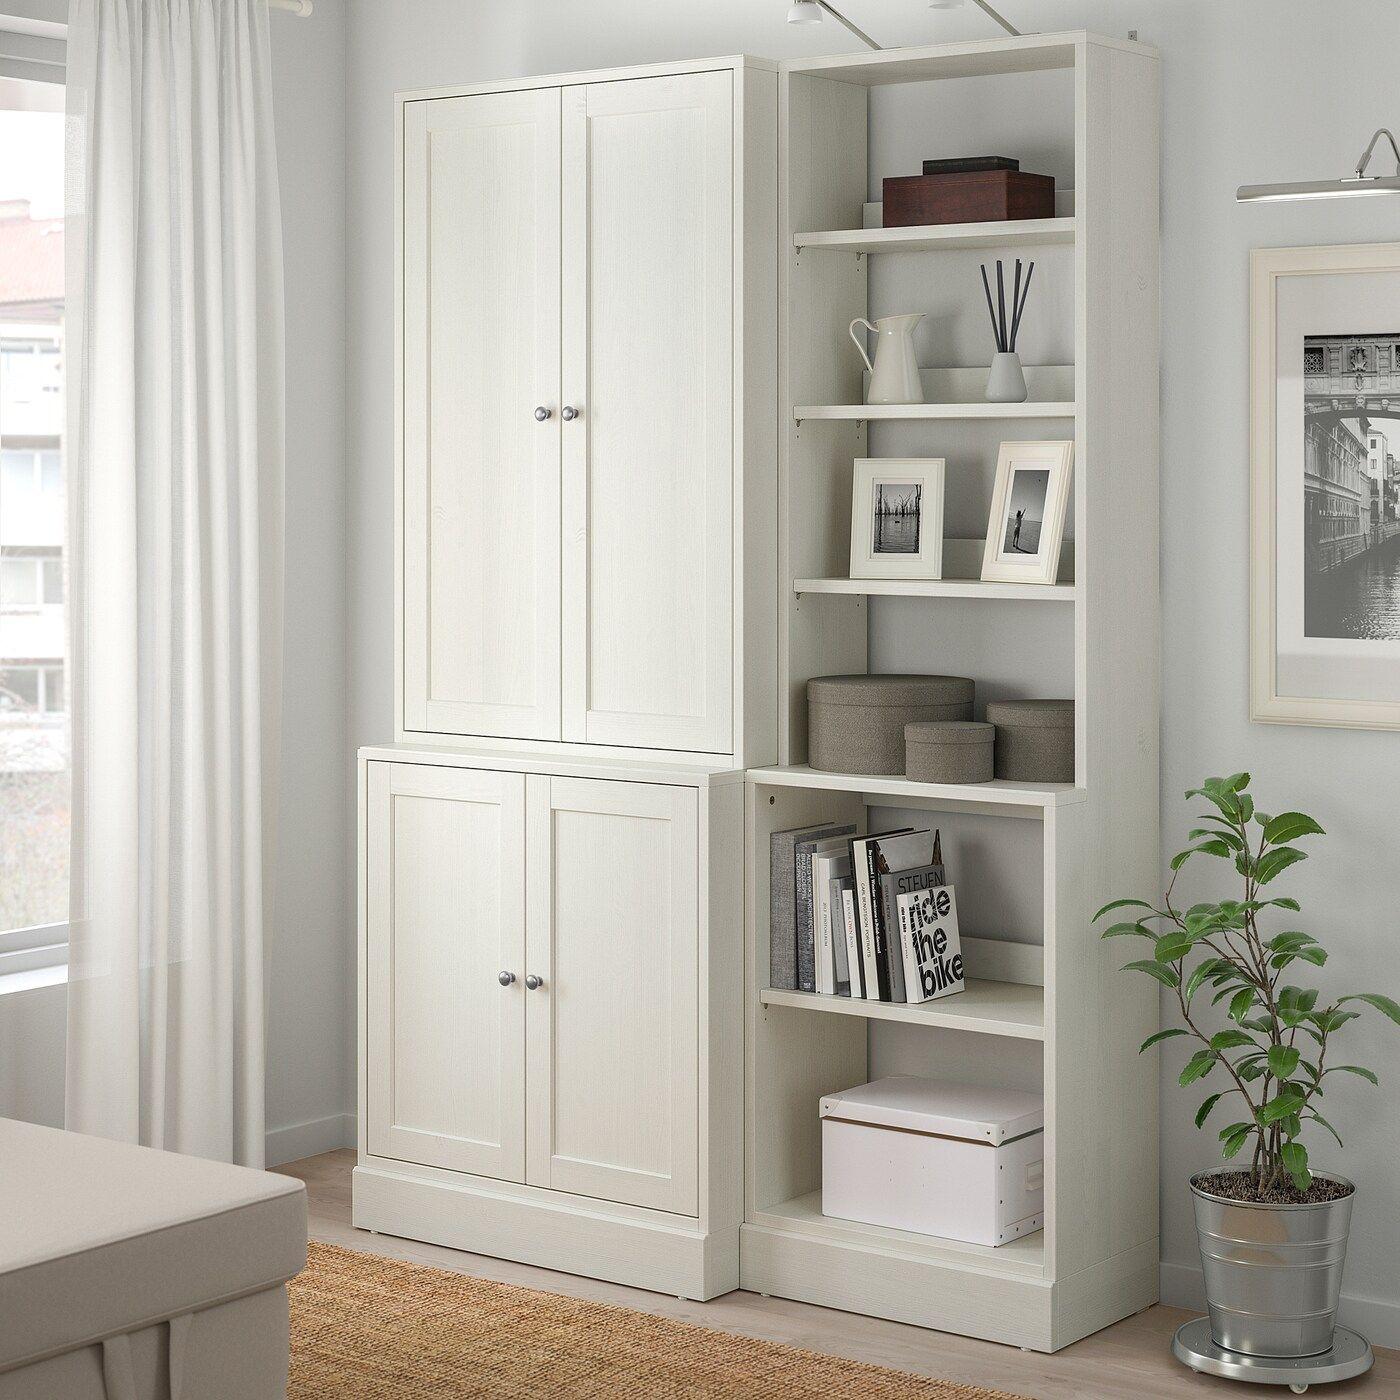 IKEA HAVSTA White Storage Combination In 2020